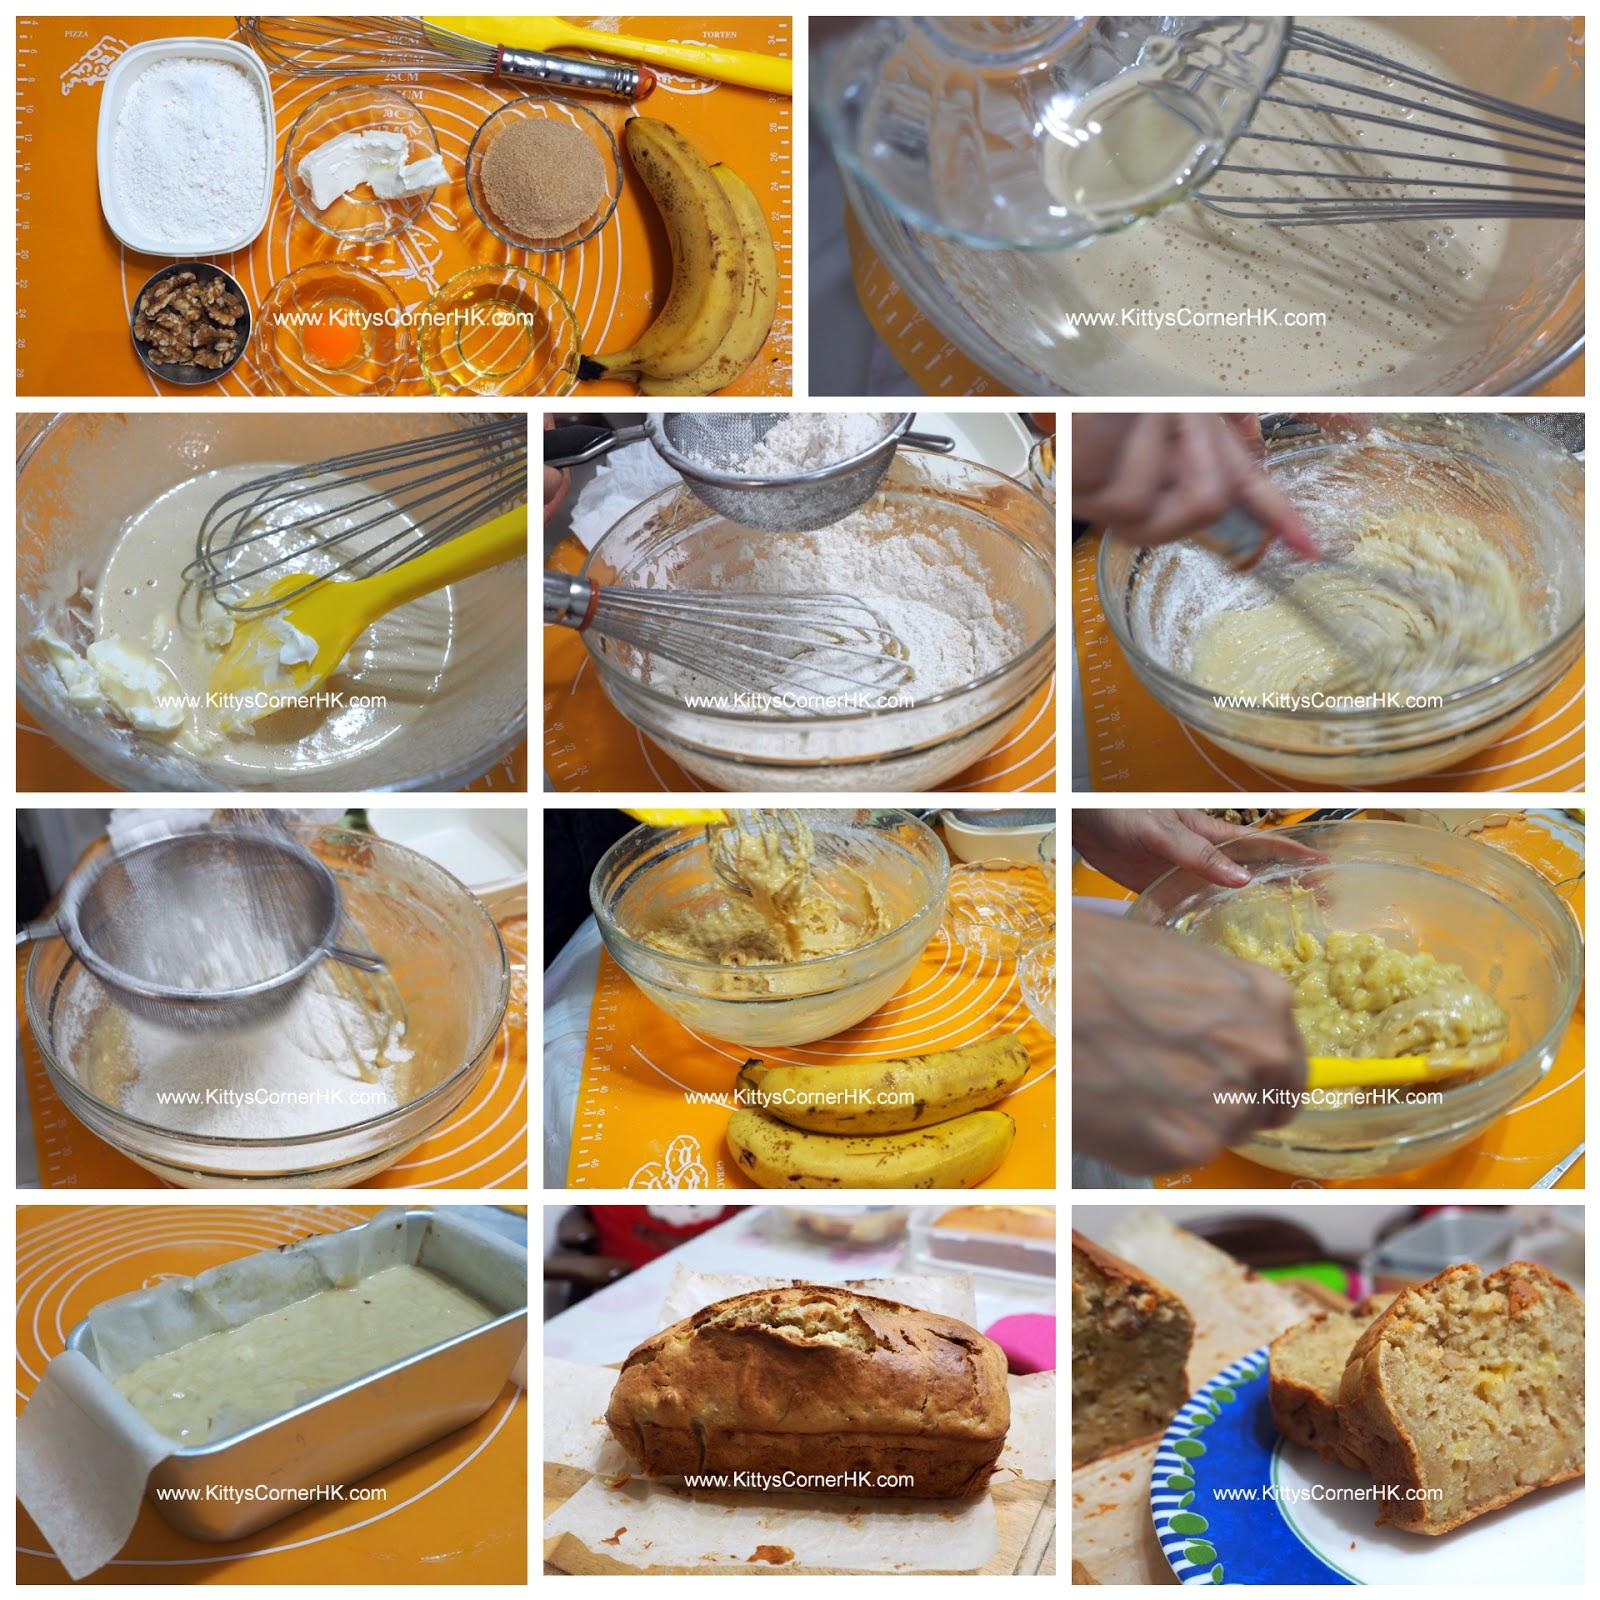 Cream Cheese Banana Bread 香蕉乳酪蛋糕